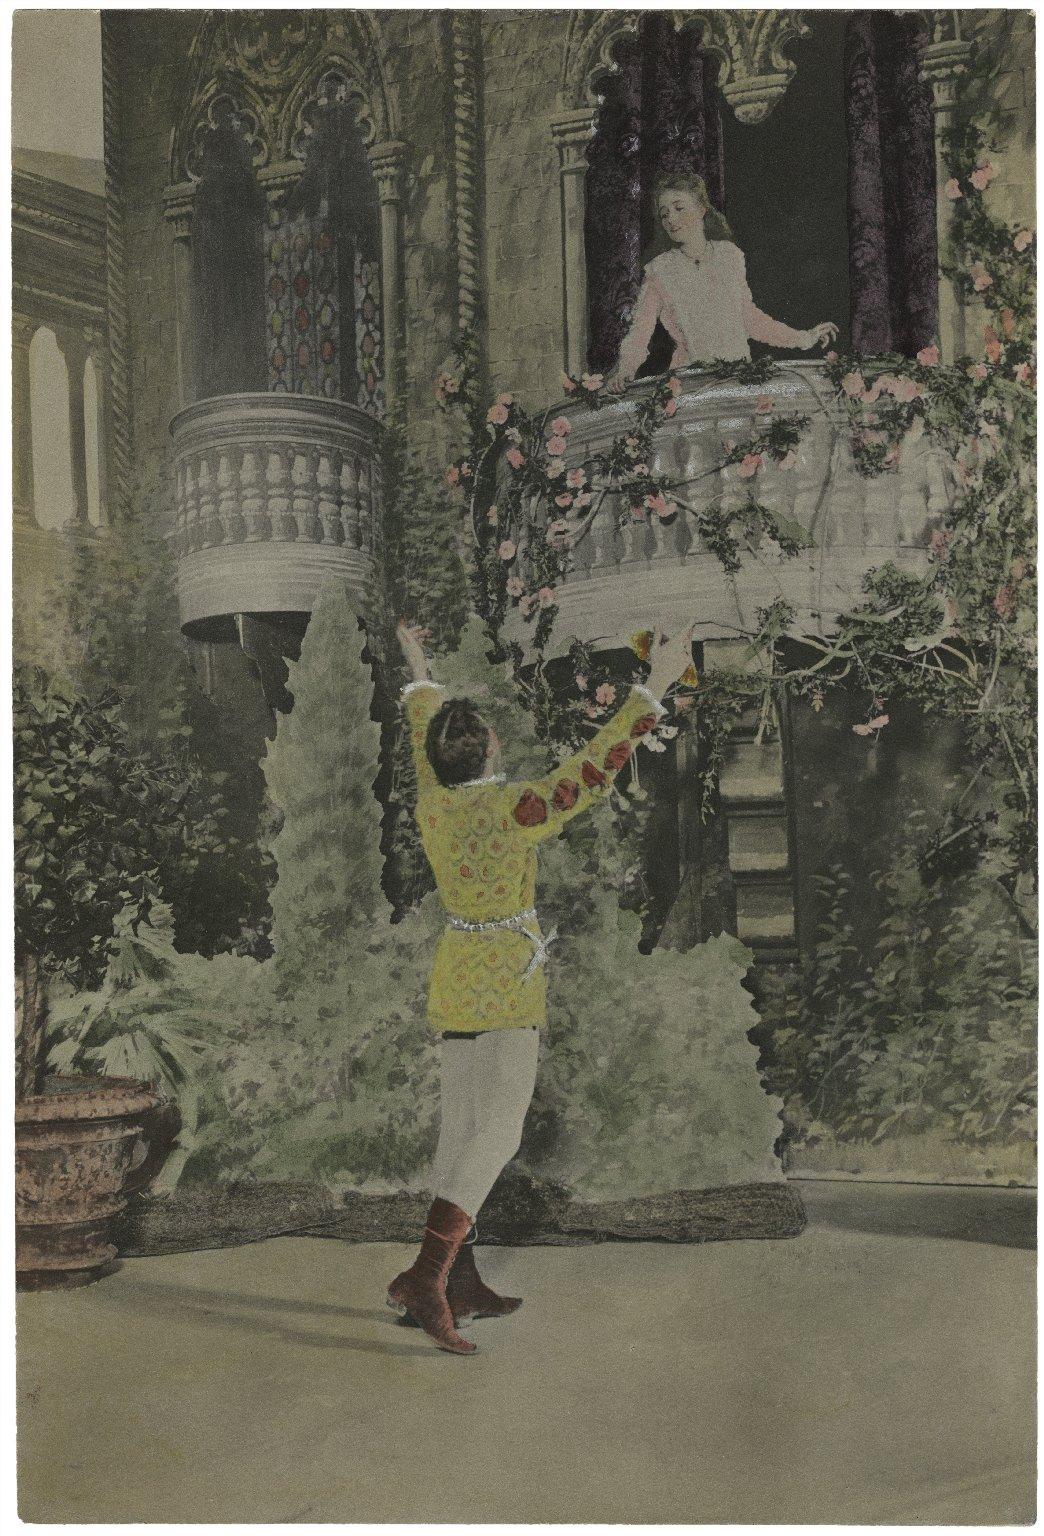 Maude Adams as Juliet in Romeo and Juliet [graphic].